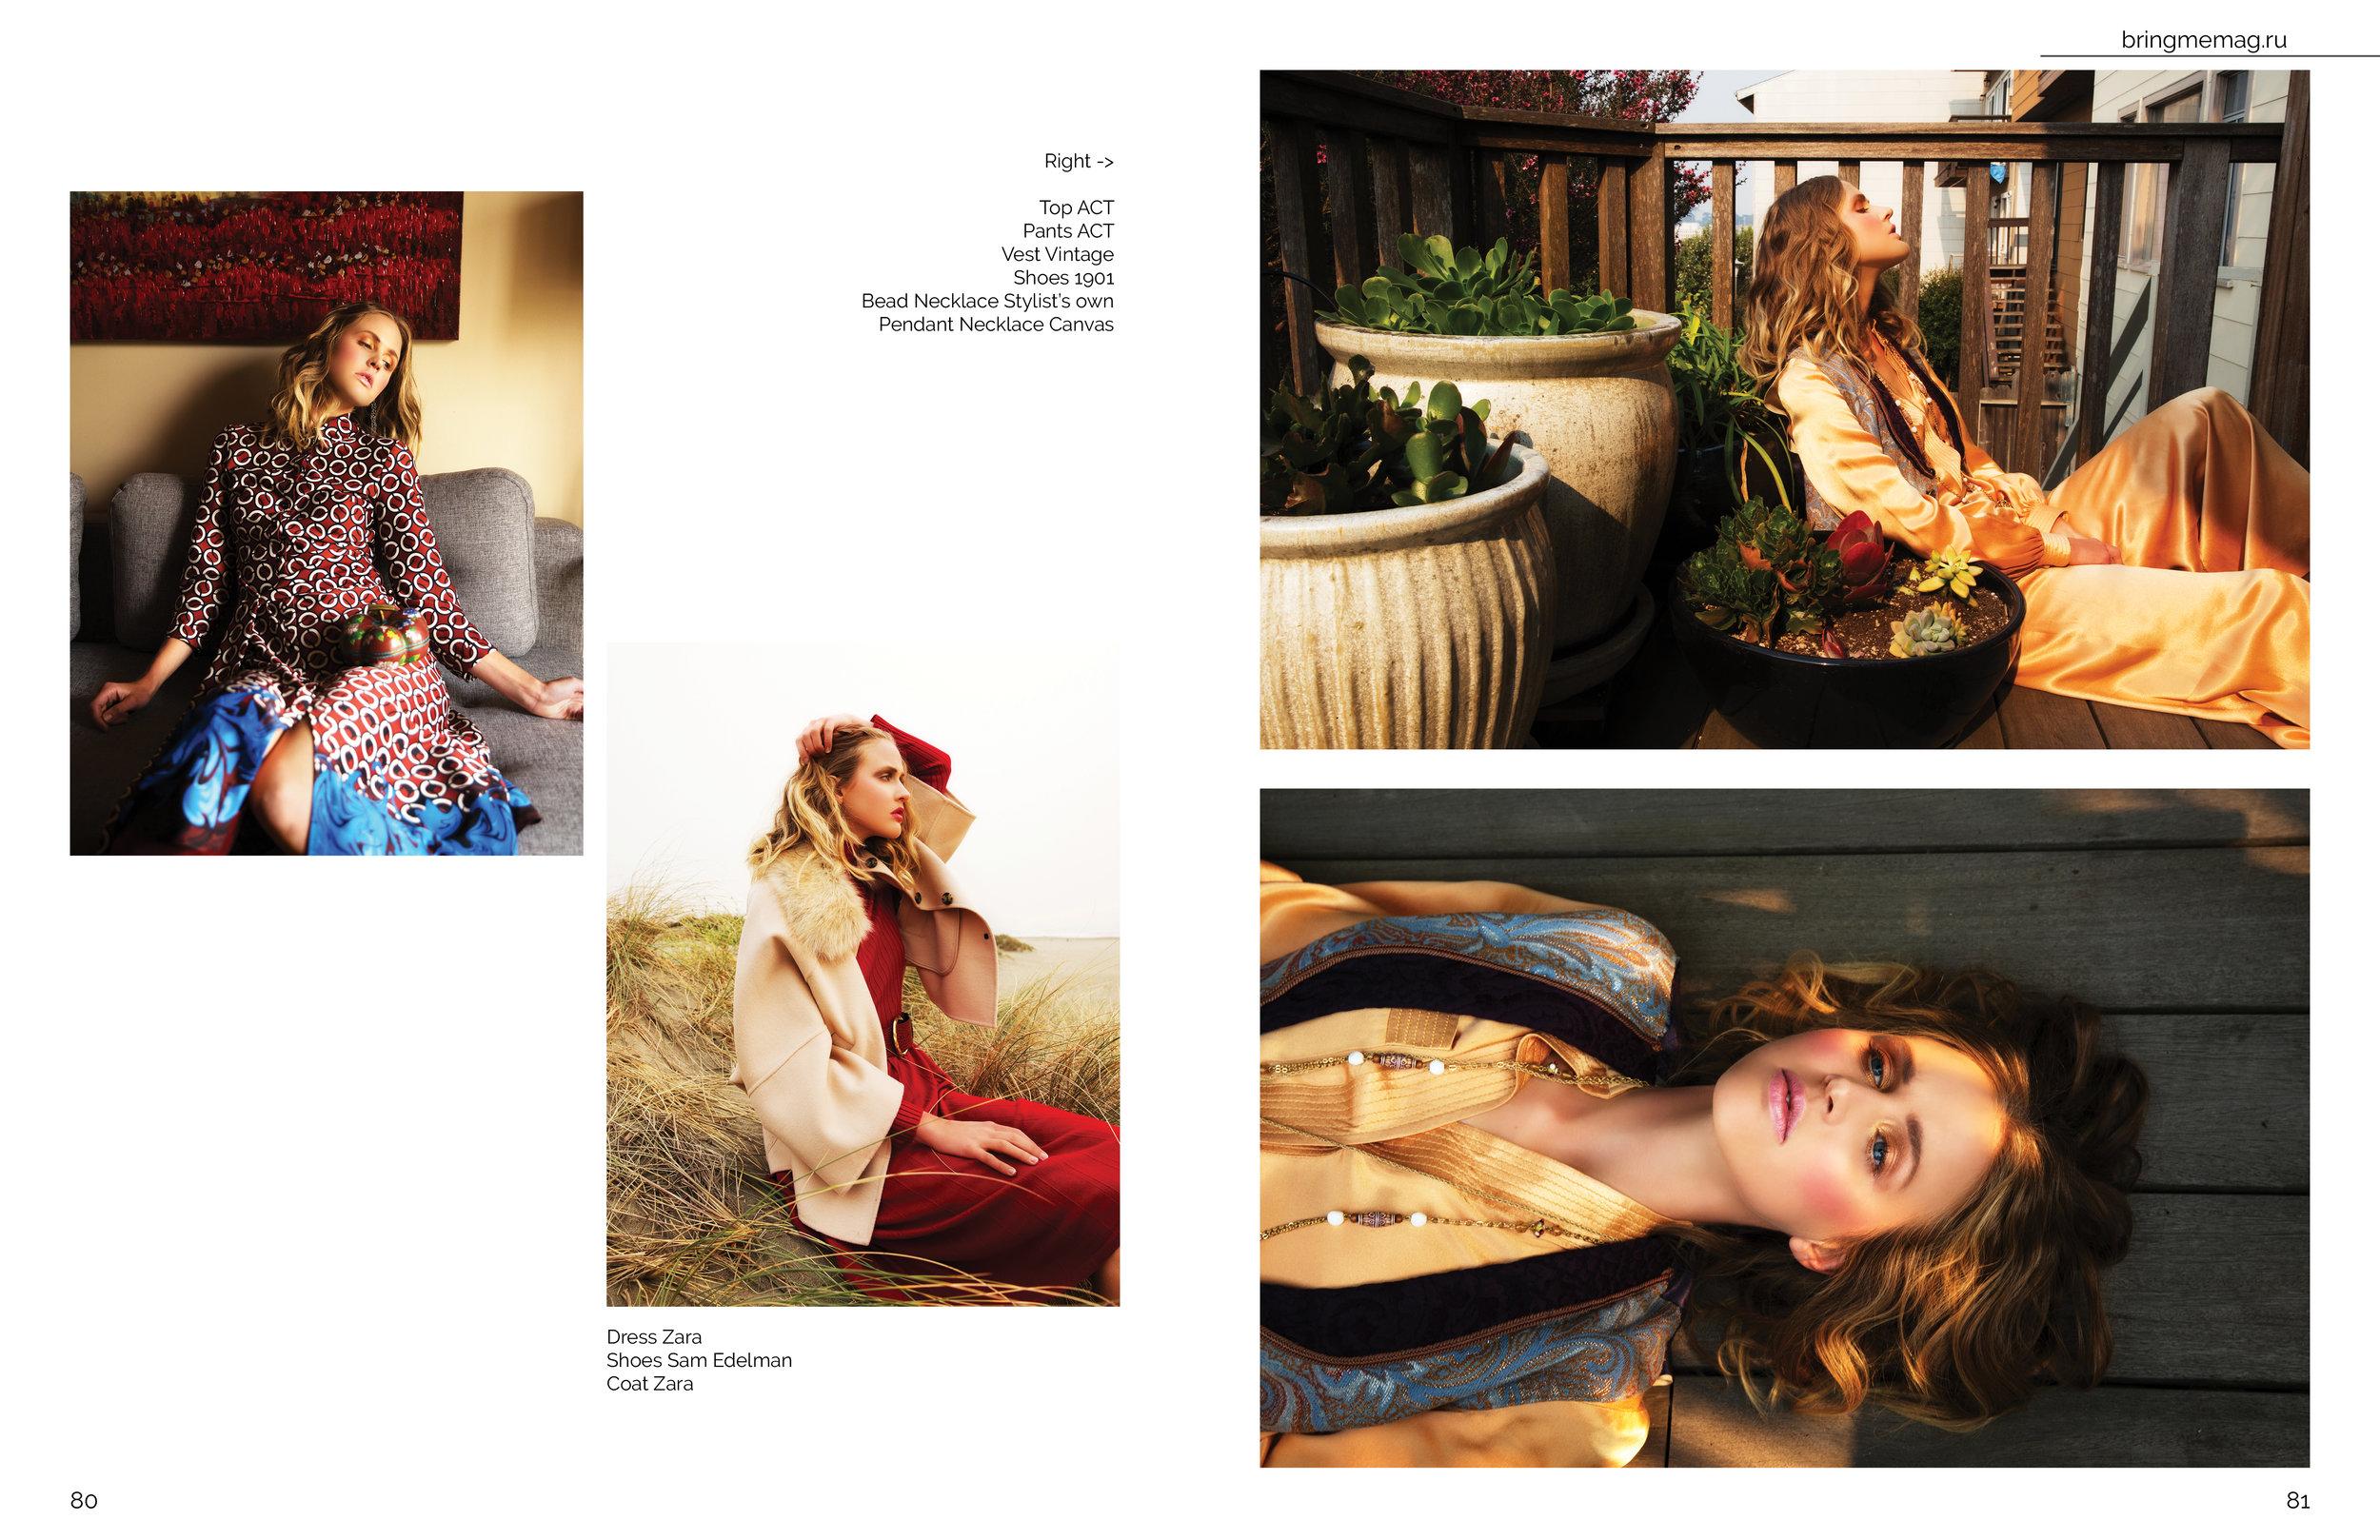 Issue 1441.jpg